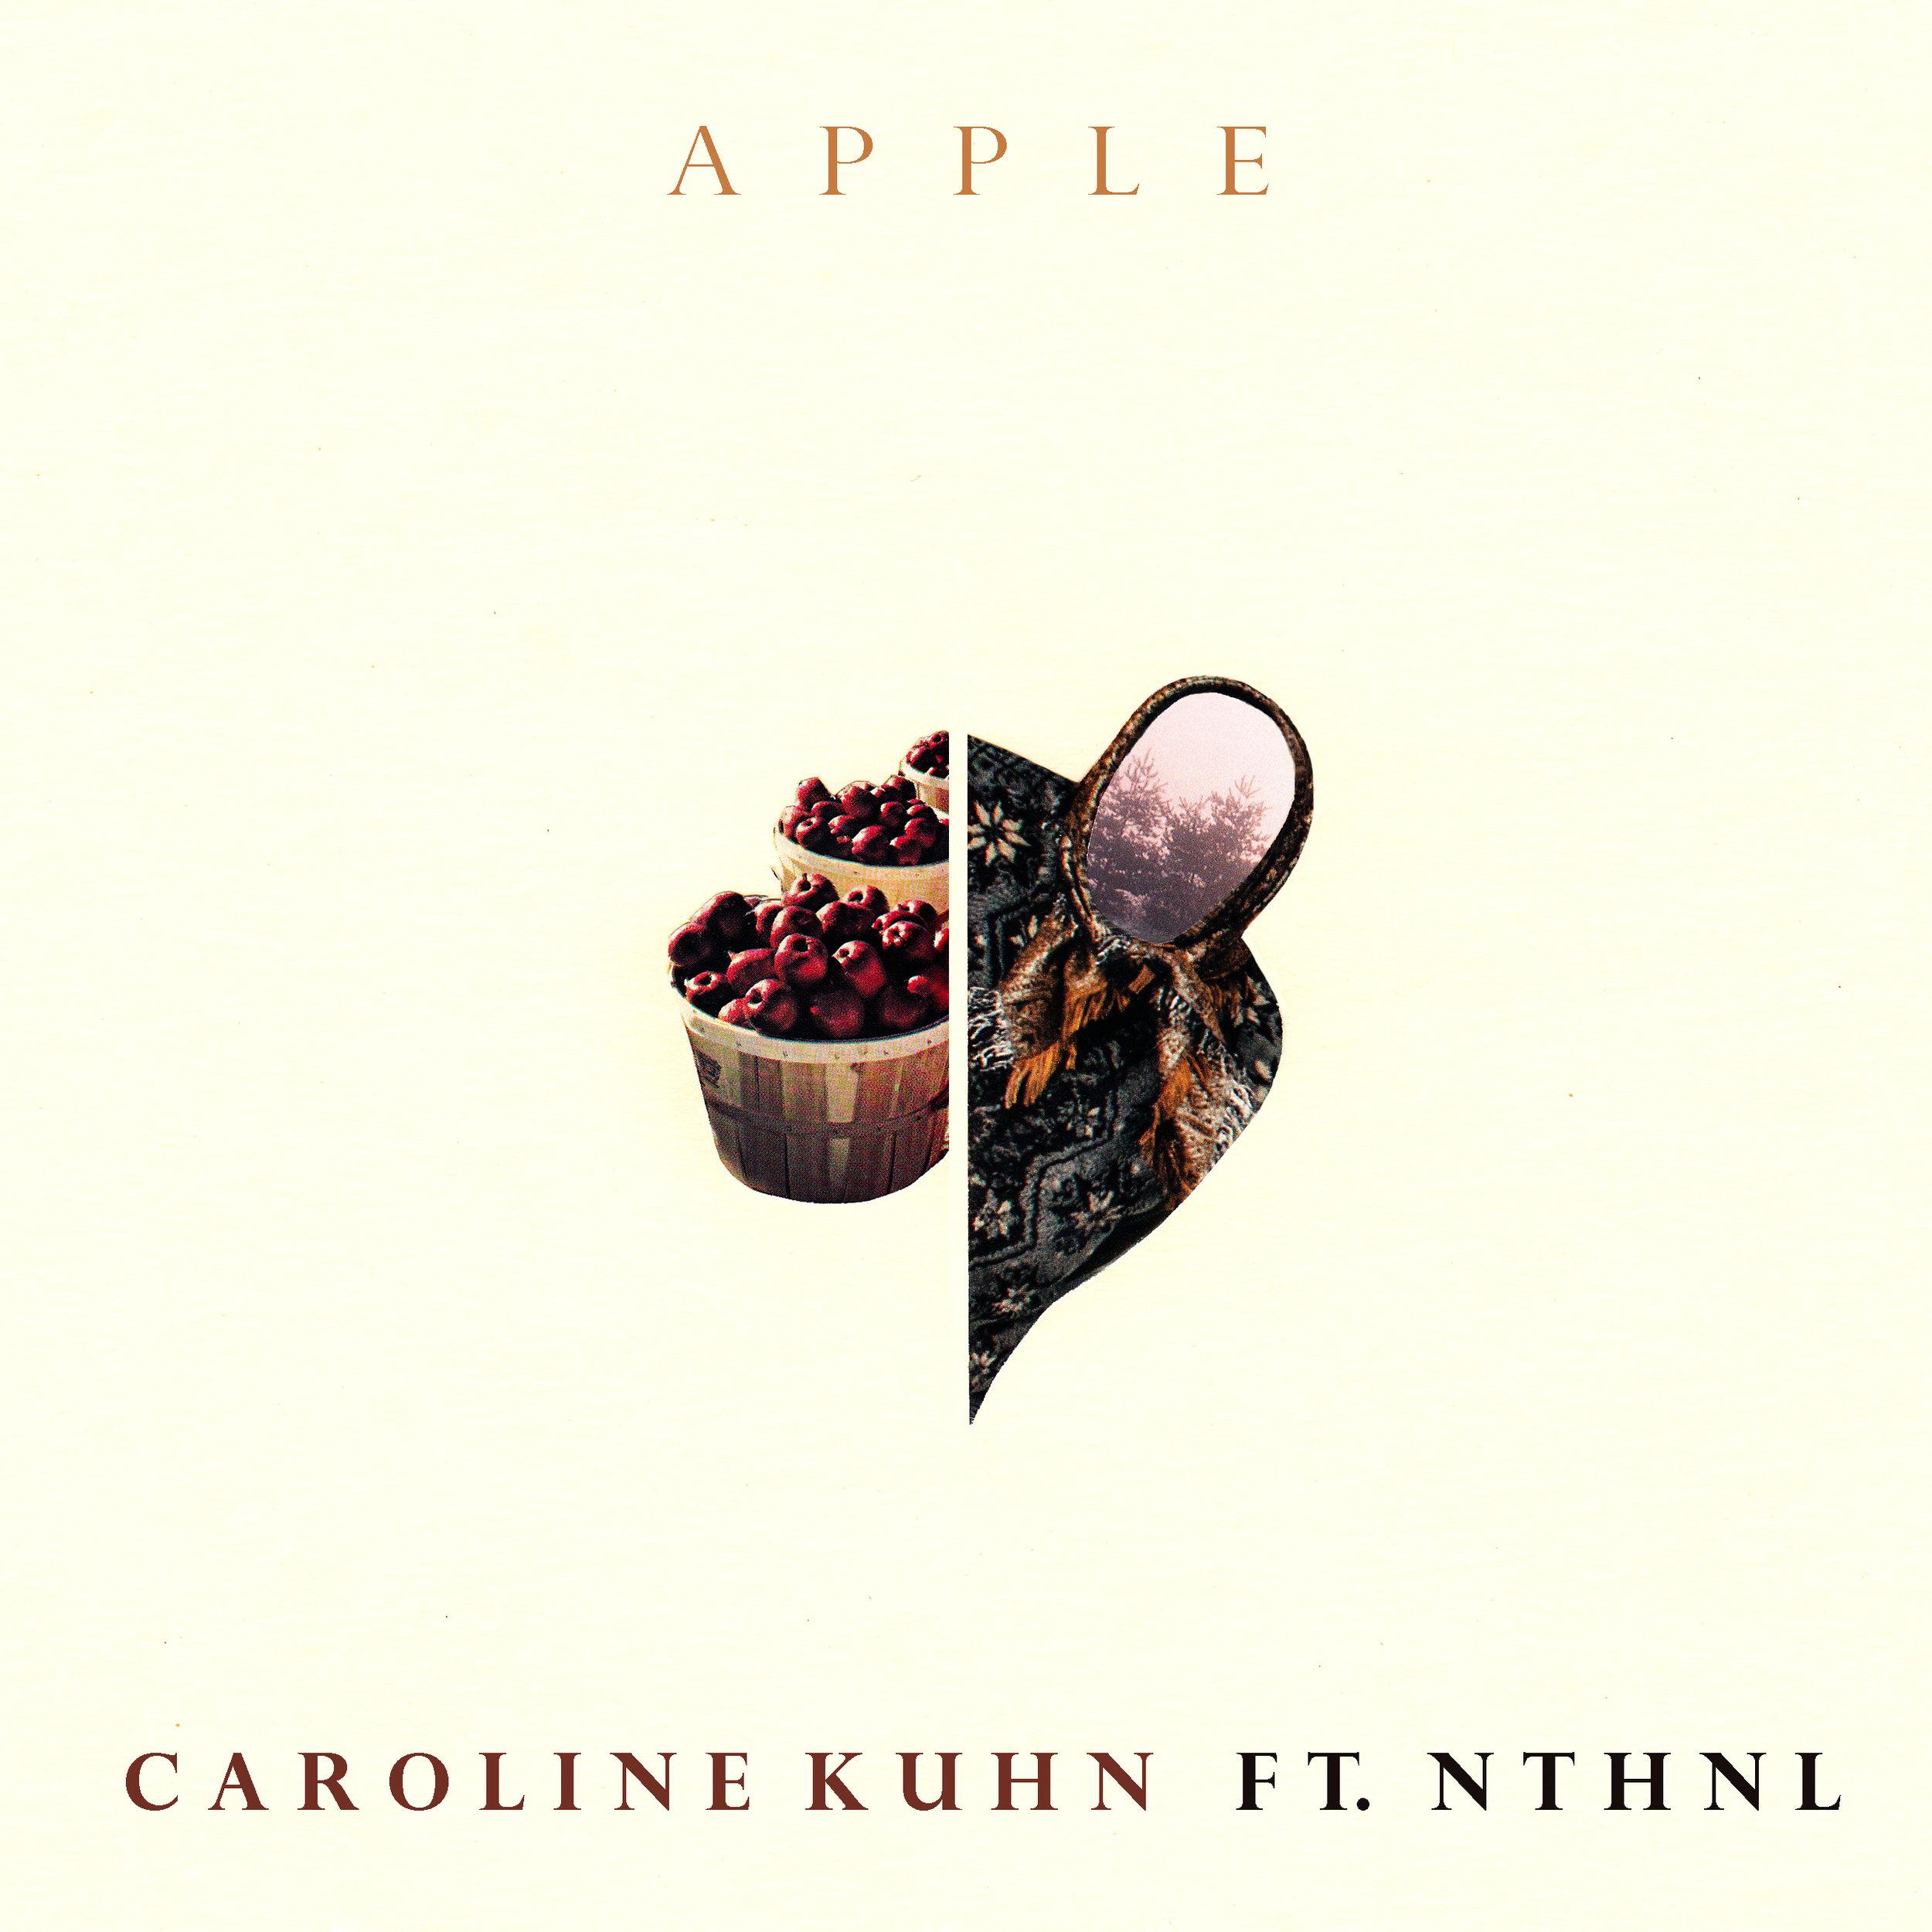 Apple by Caroline Kuhn